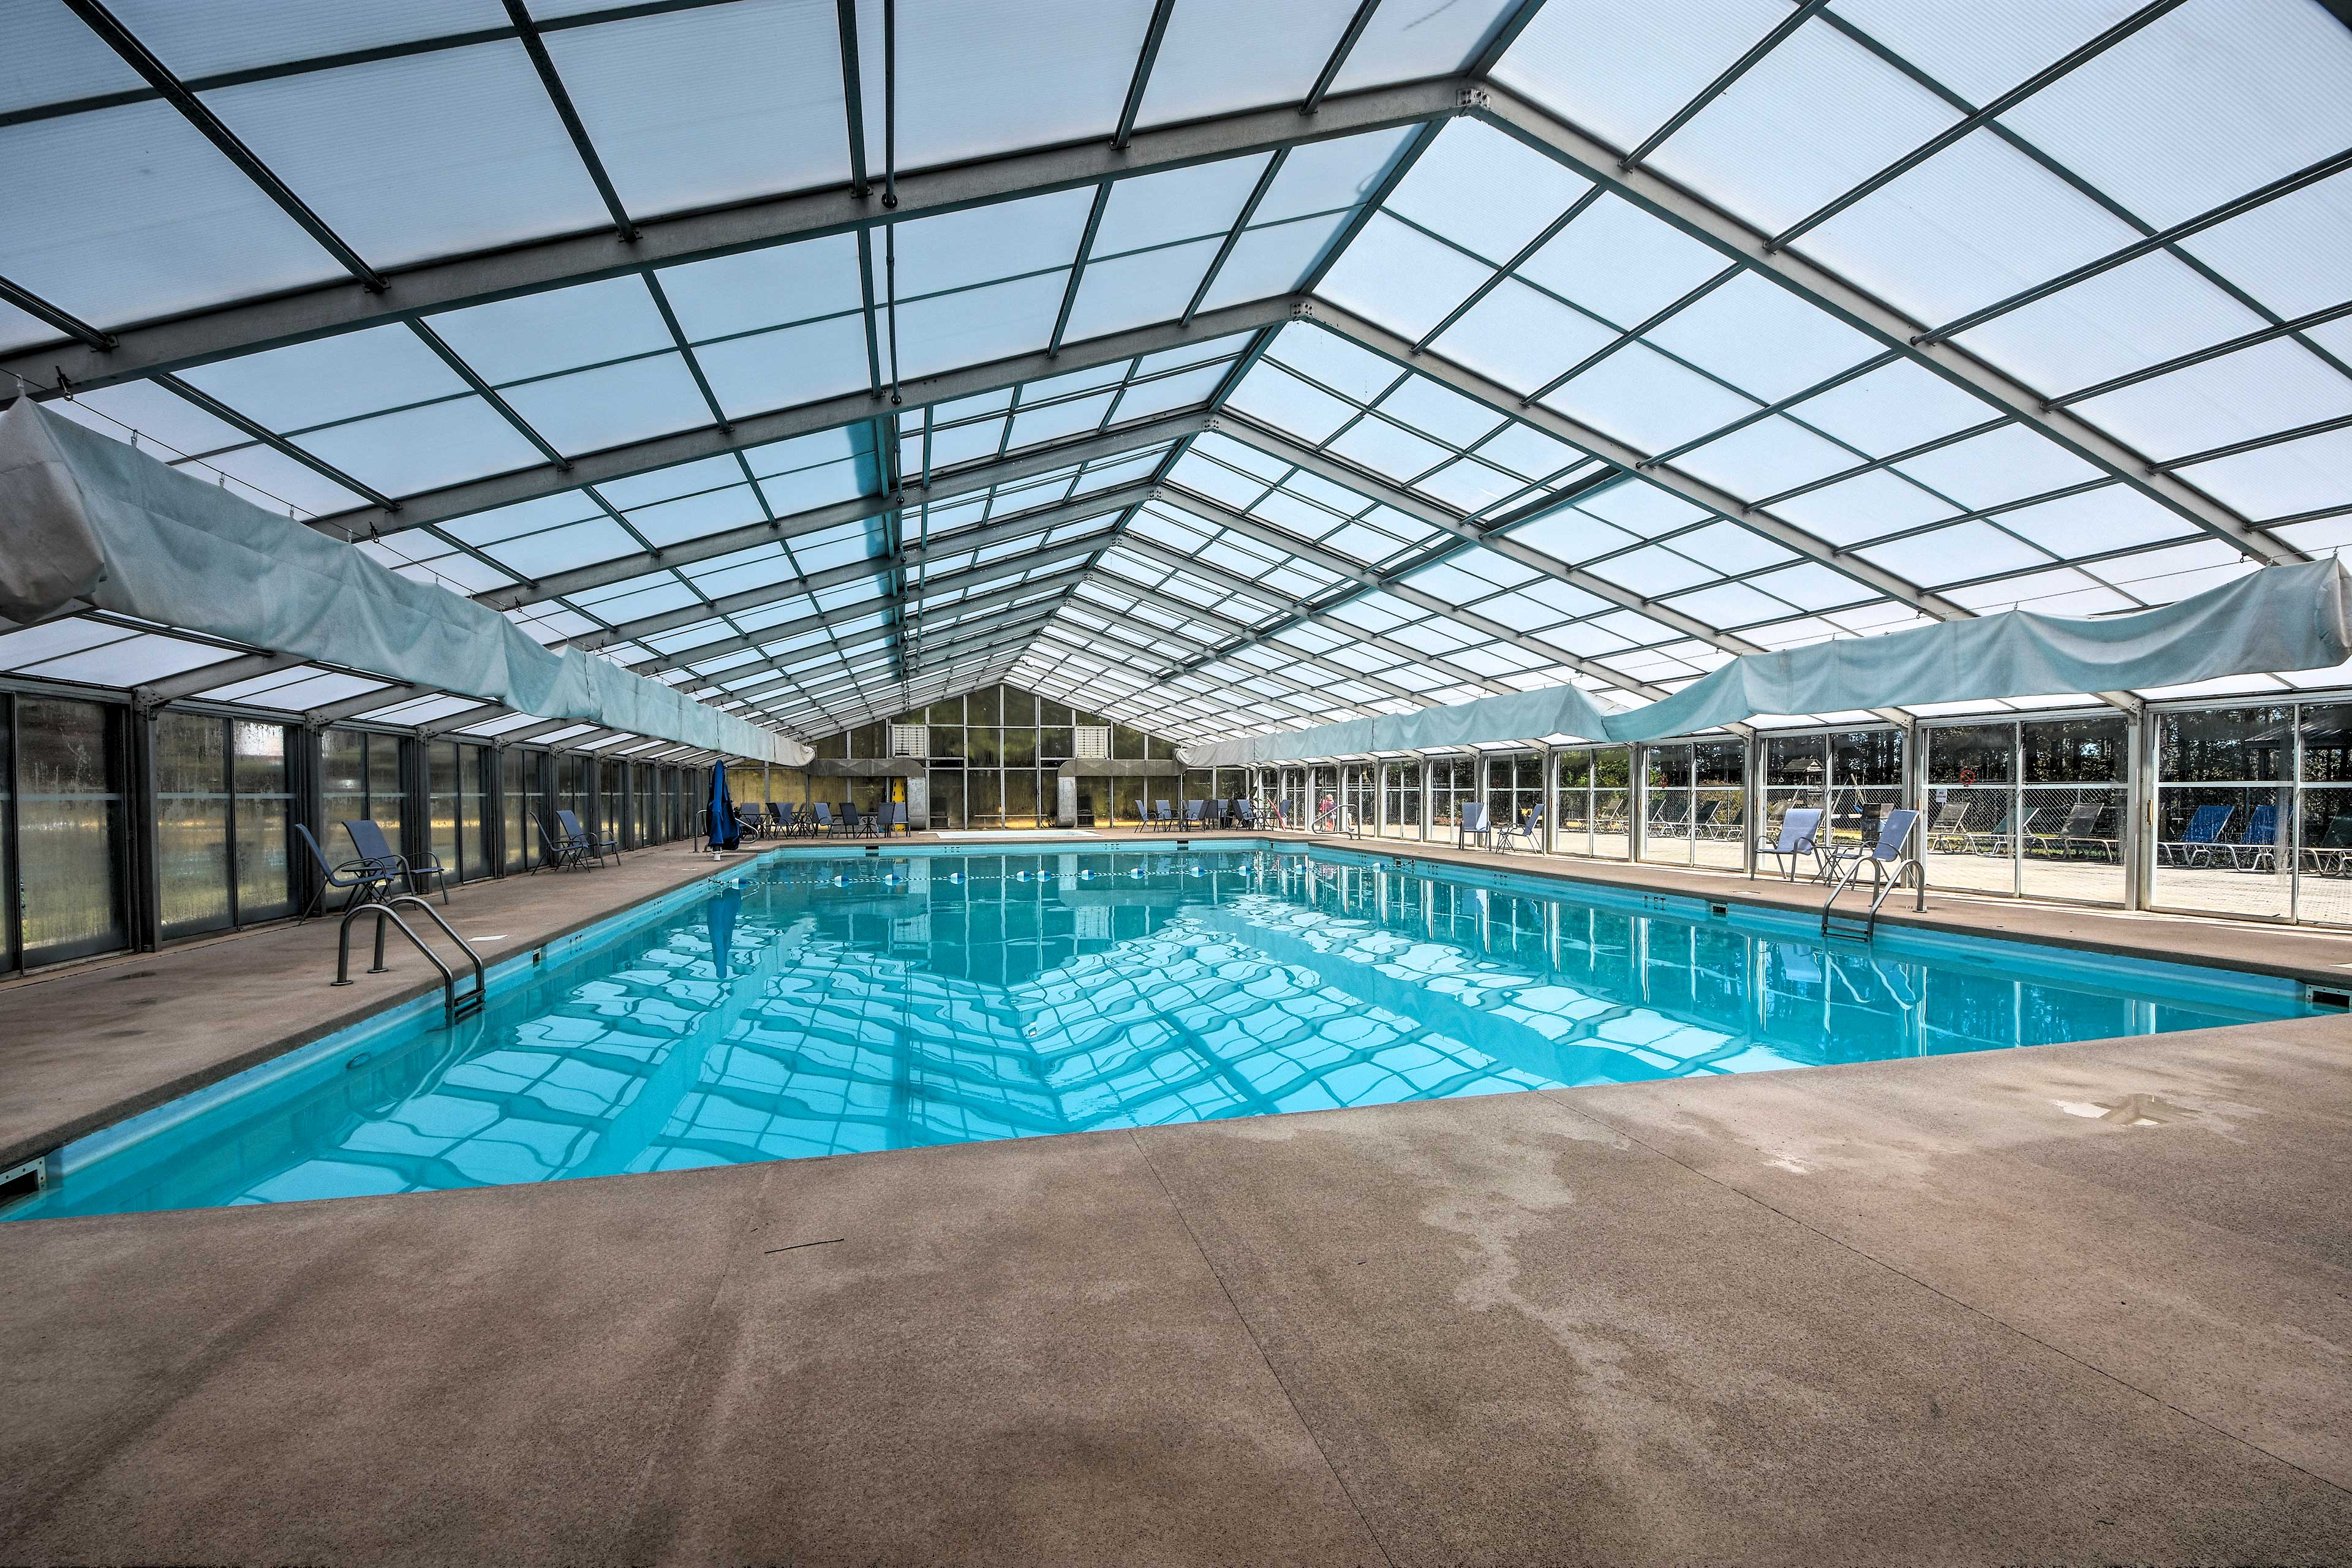 Splash around in the indoor community pool!